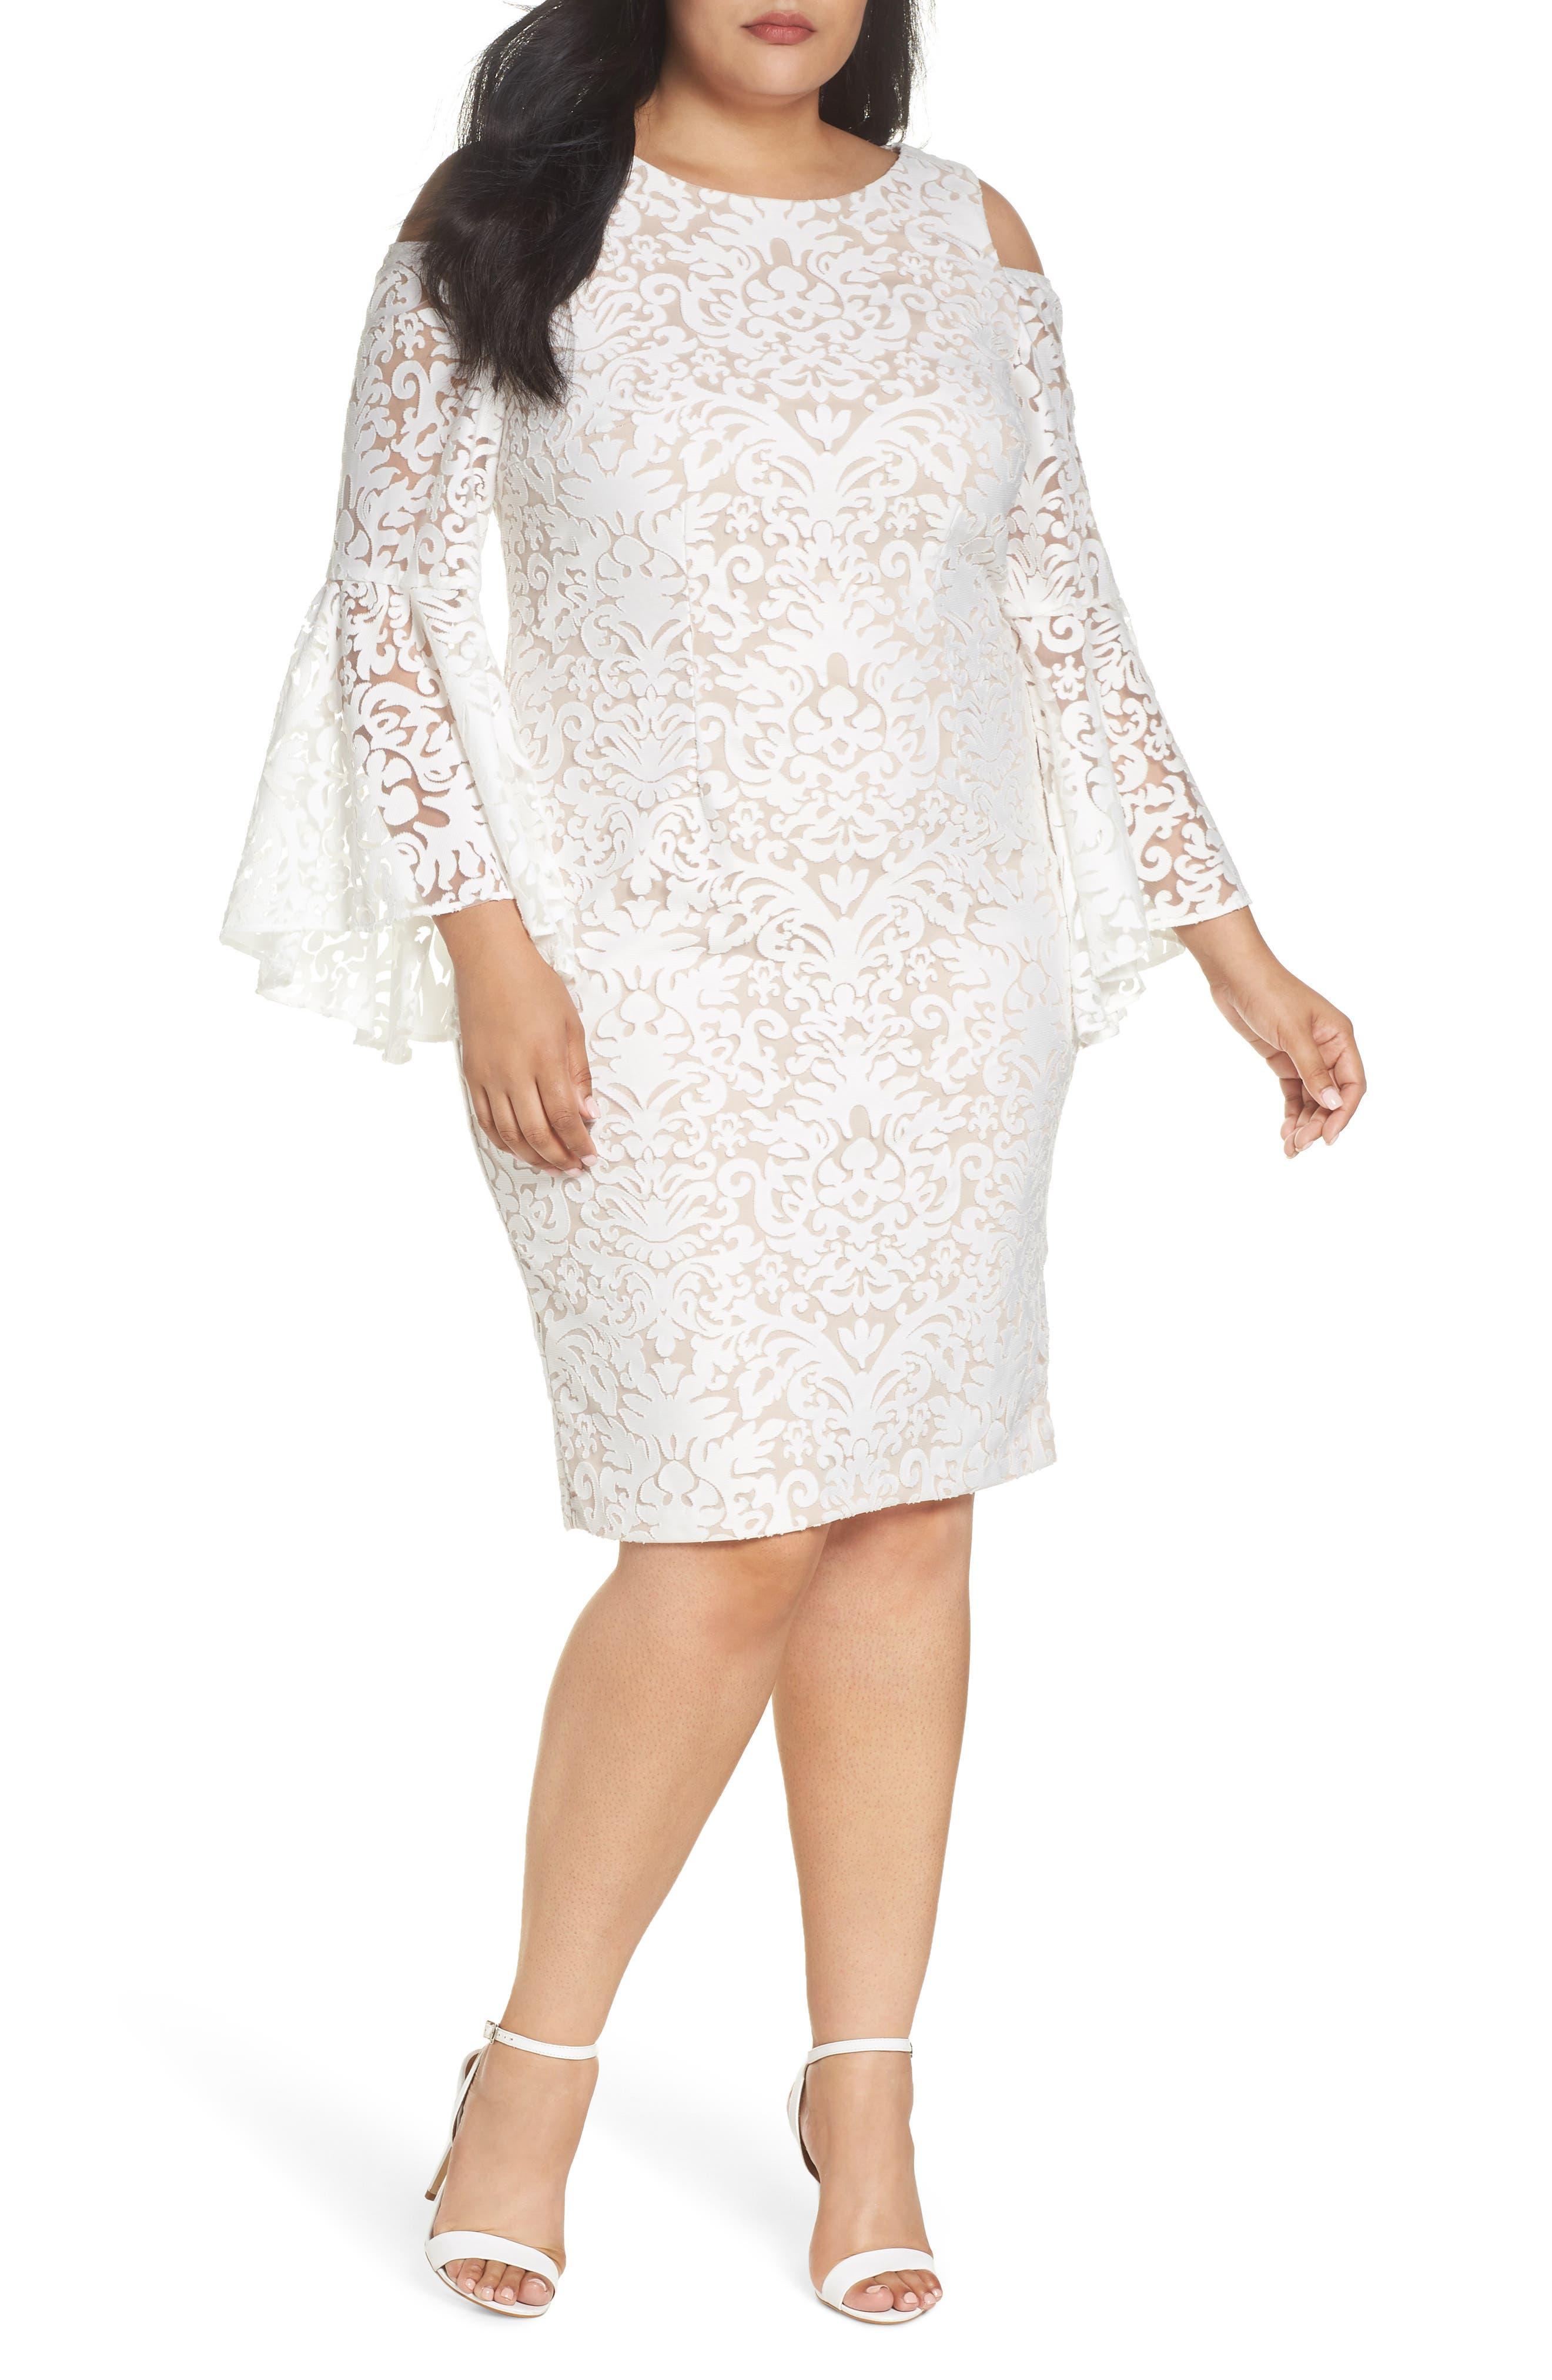 Main Image - Xscape Lace Bell Sleeve Sheath Dress (Plus Size)